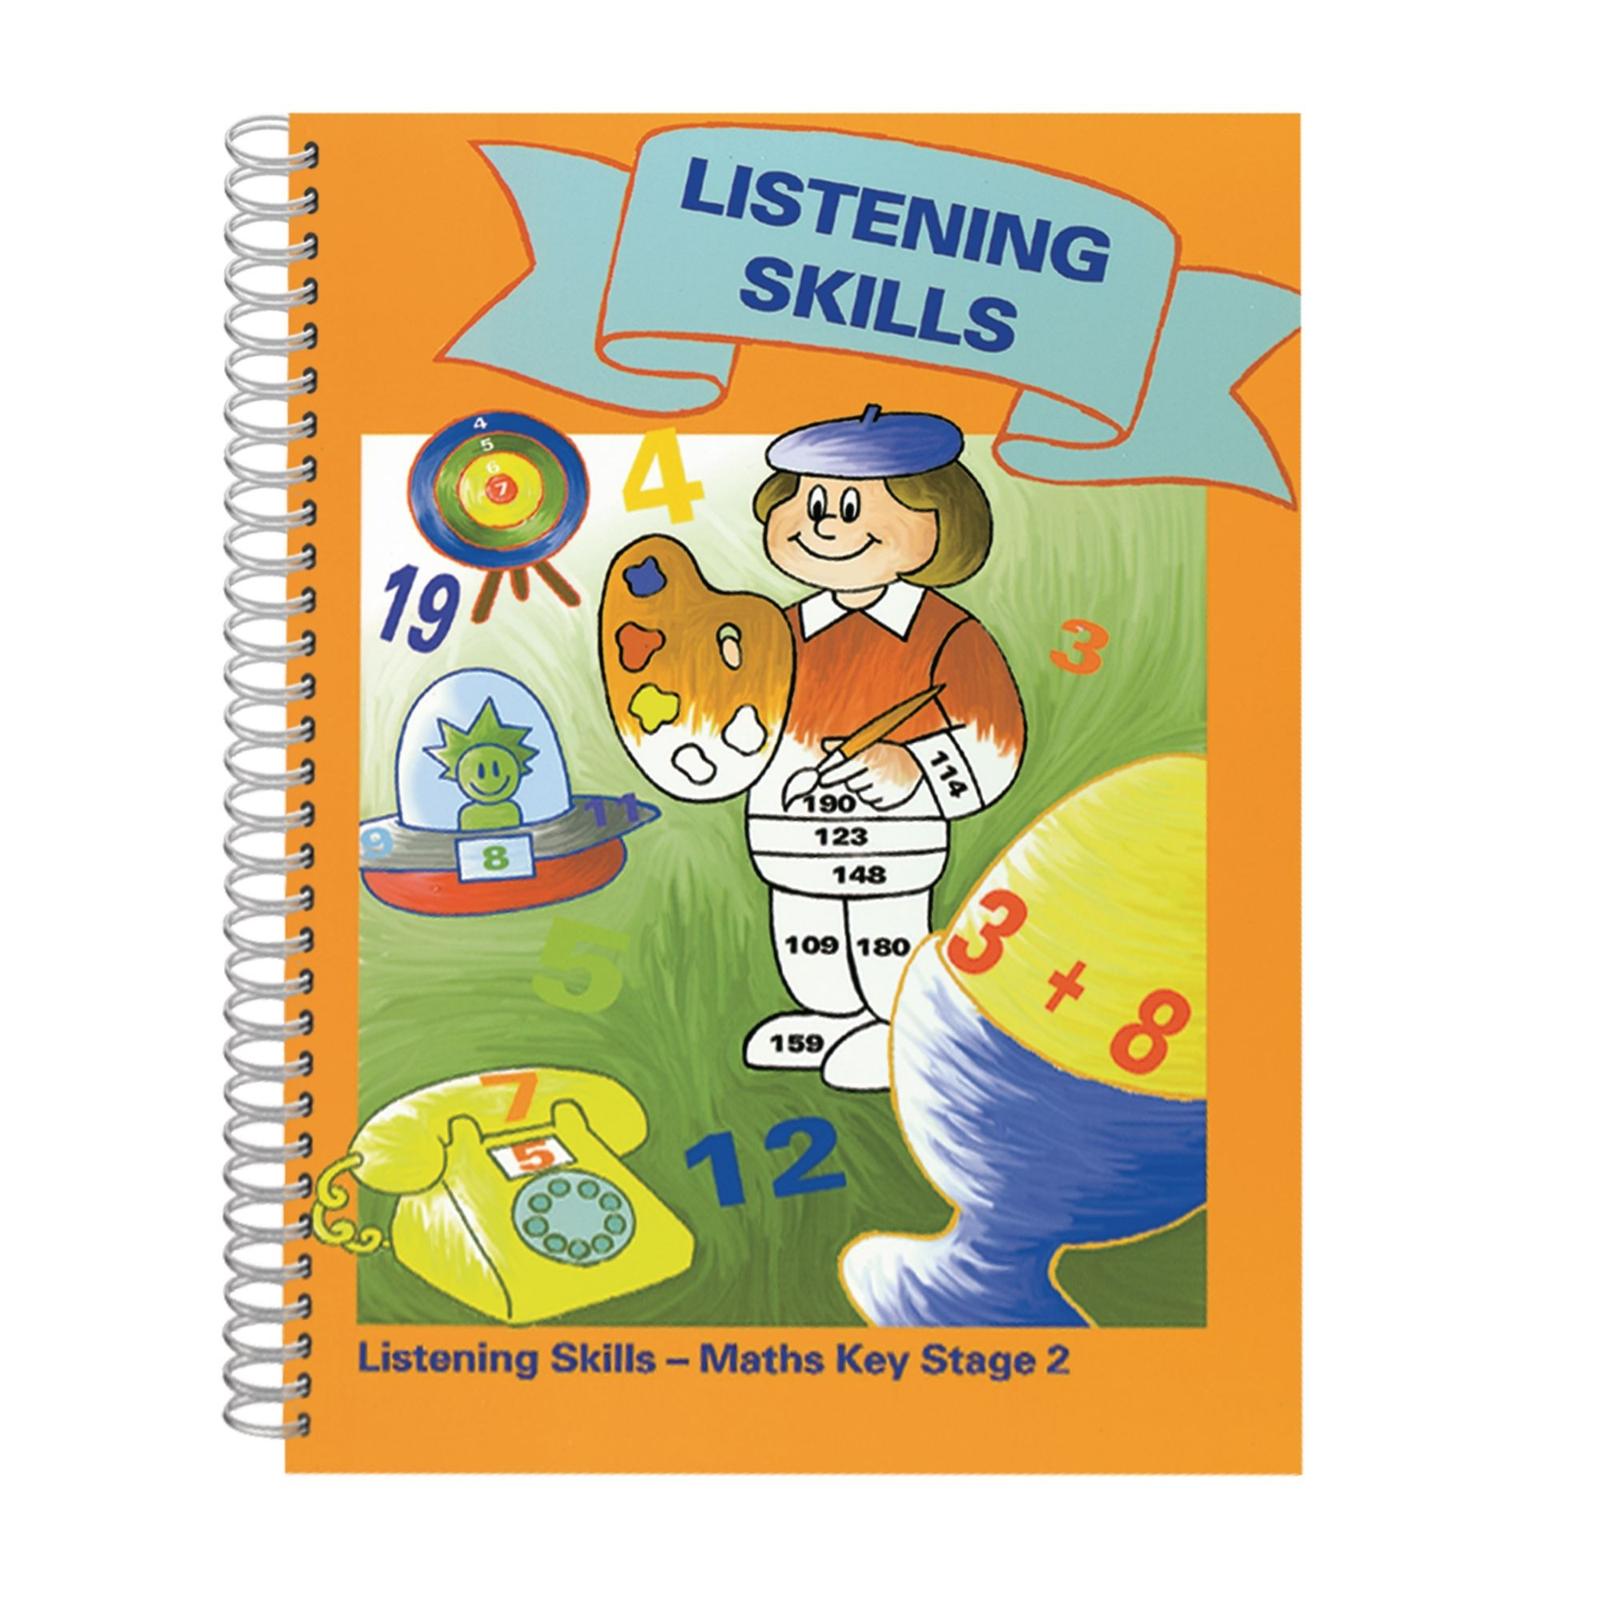 Maths Listening Skills - Key Stage 2 - Age 7-11 | LDA Resources